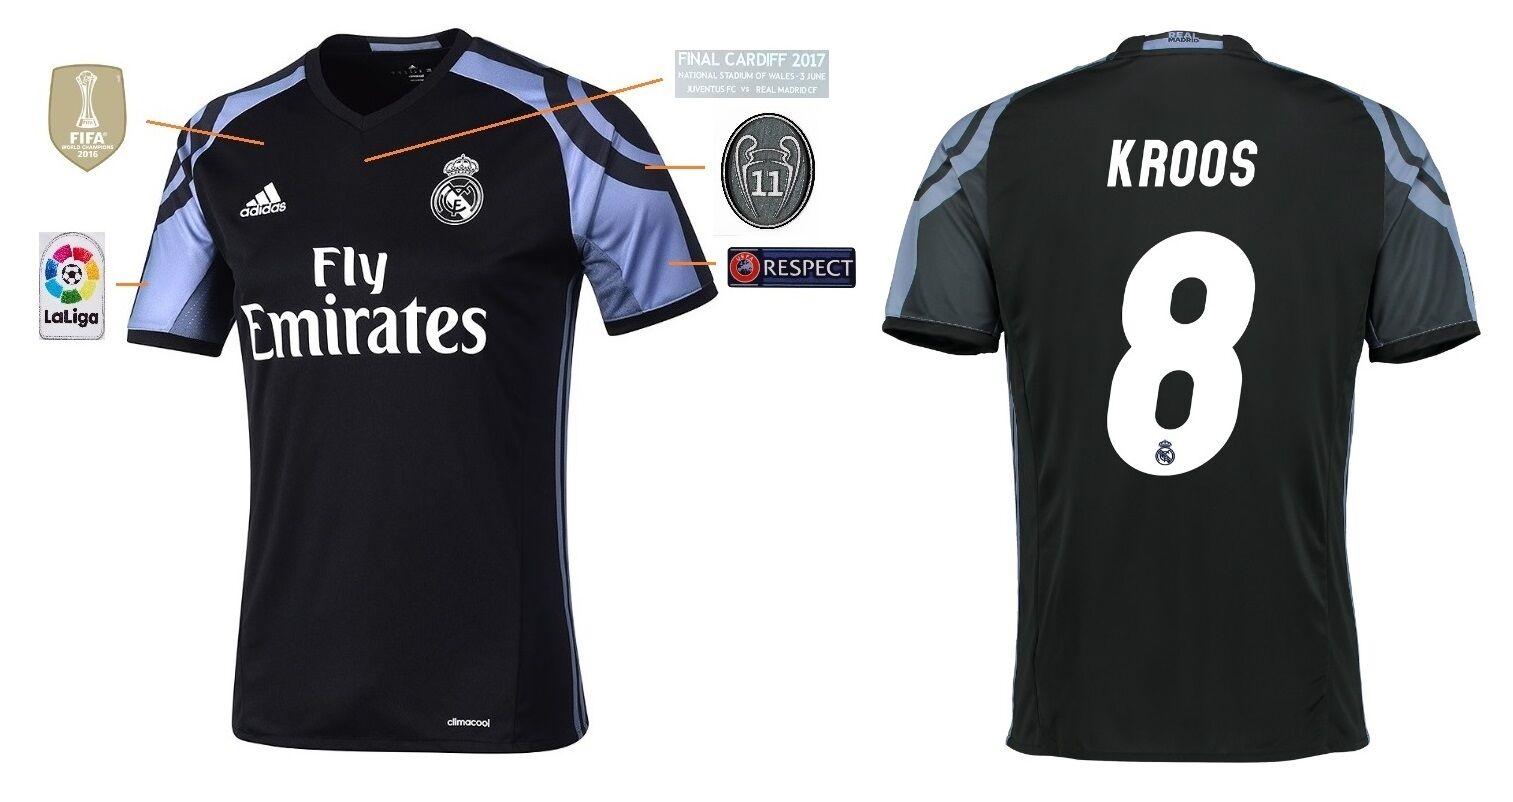 Trikot Real Madrid Third Champions League Final Cardiff 2017 - Kroos 8